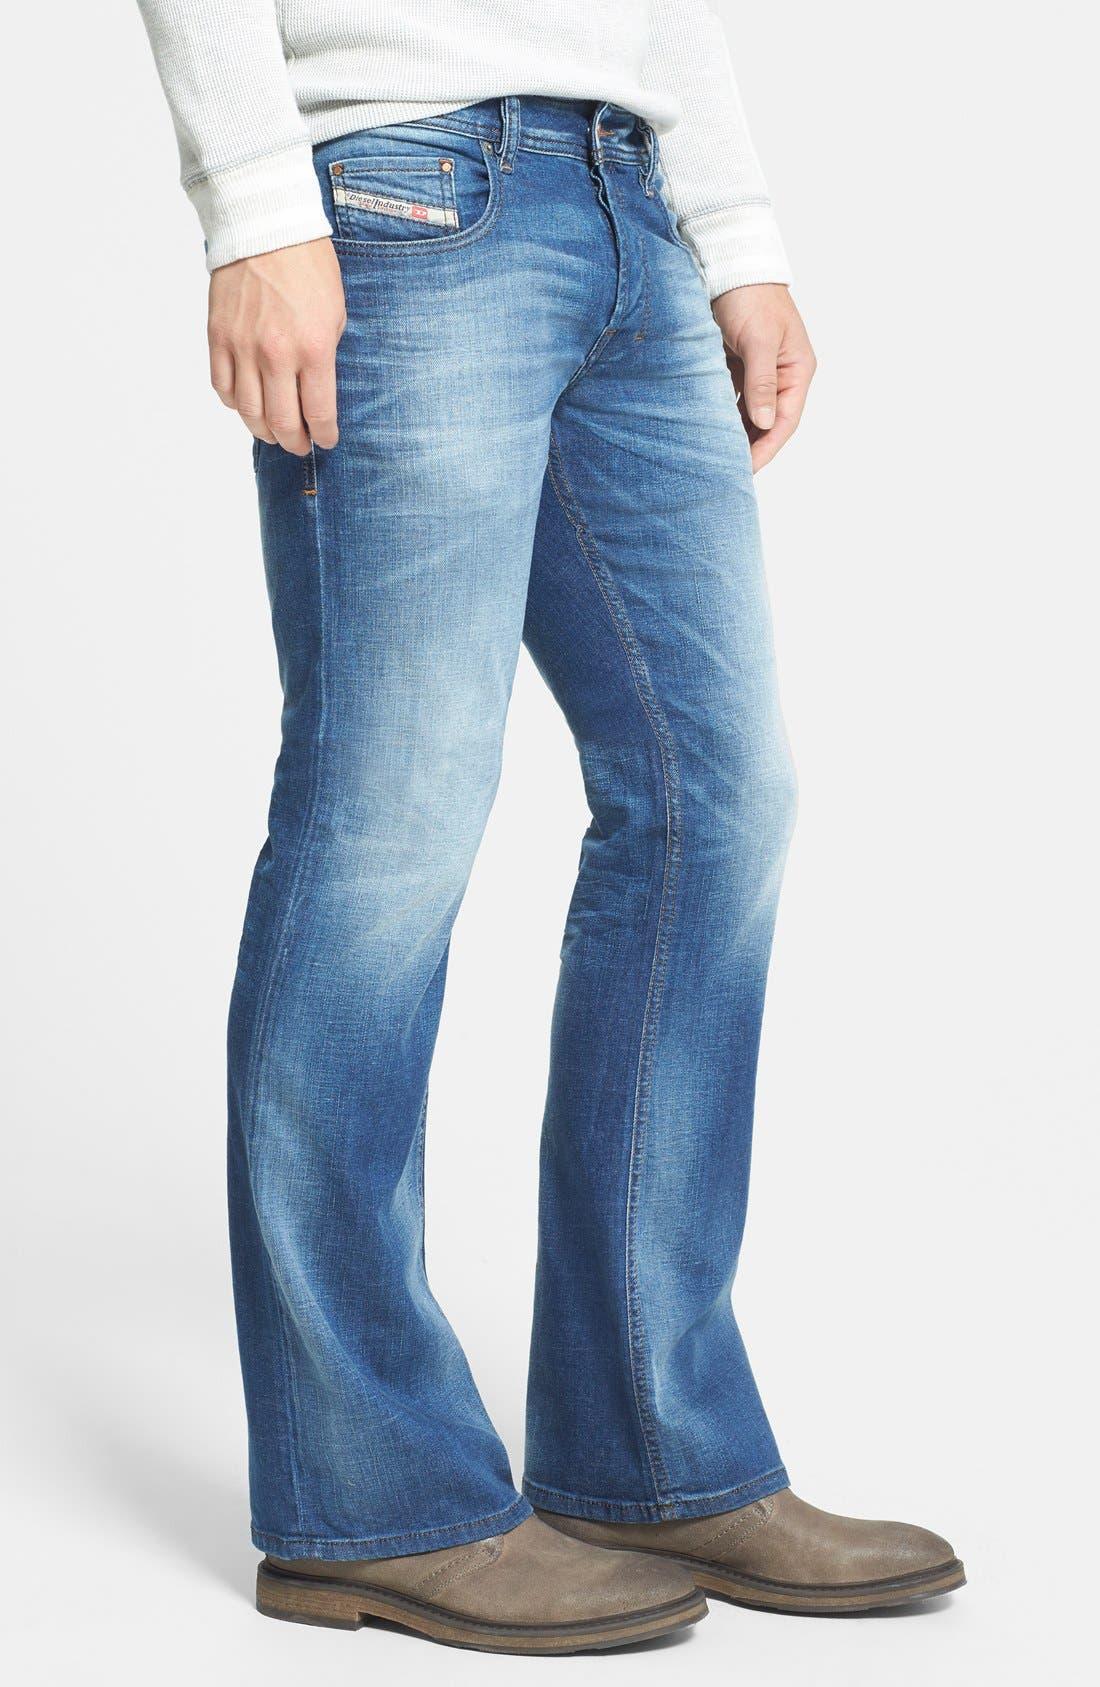 Zathan Bootcut Jeans,                             Alternate thumbnail 3, color,                             0831D